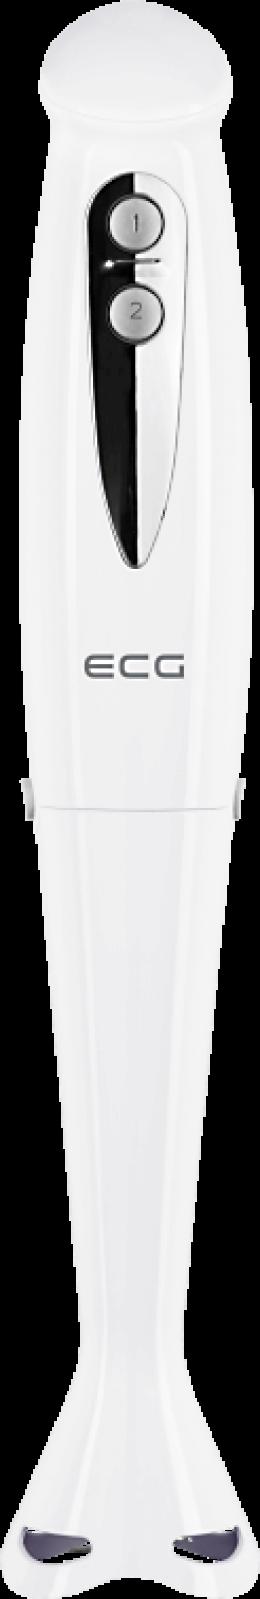 Блендер ECG RM 200